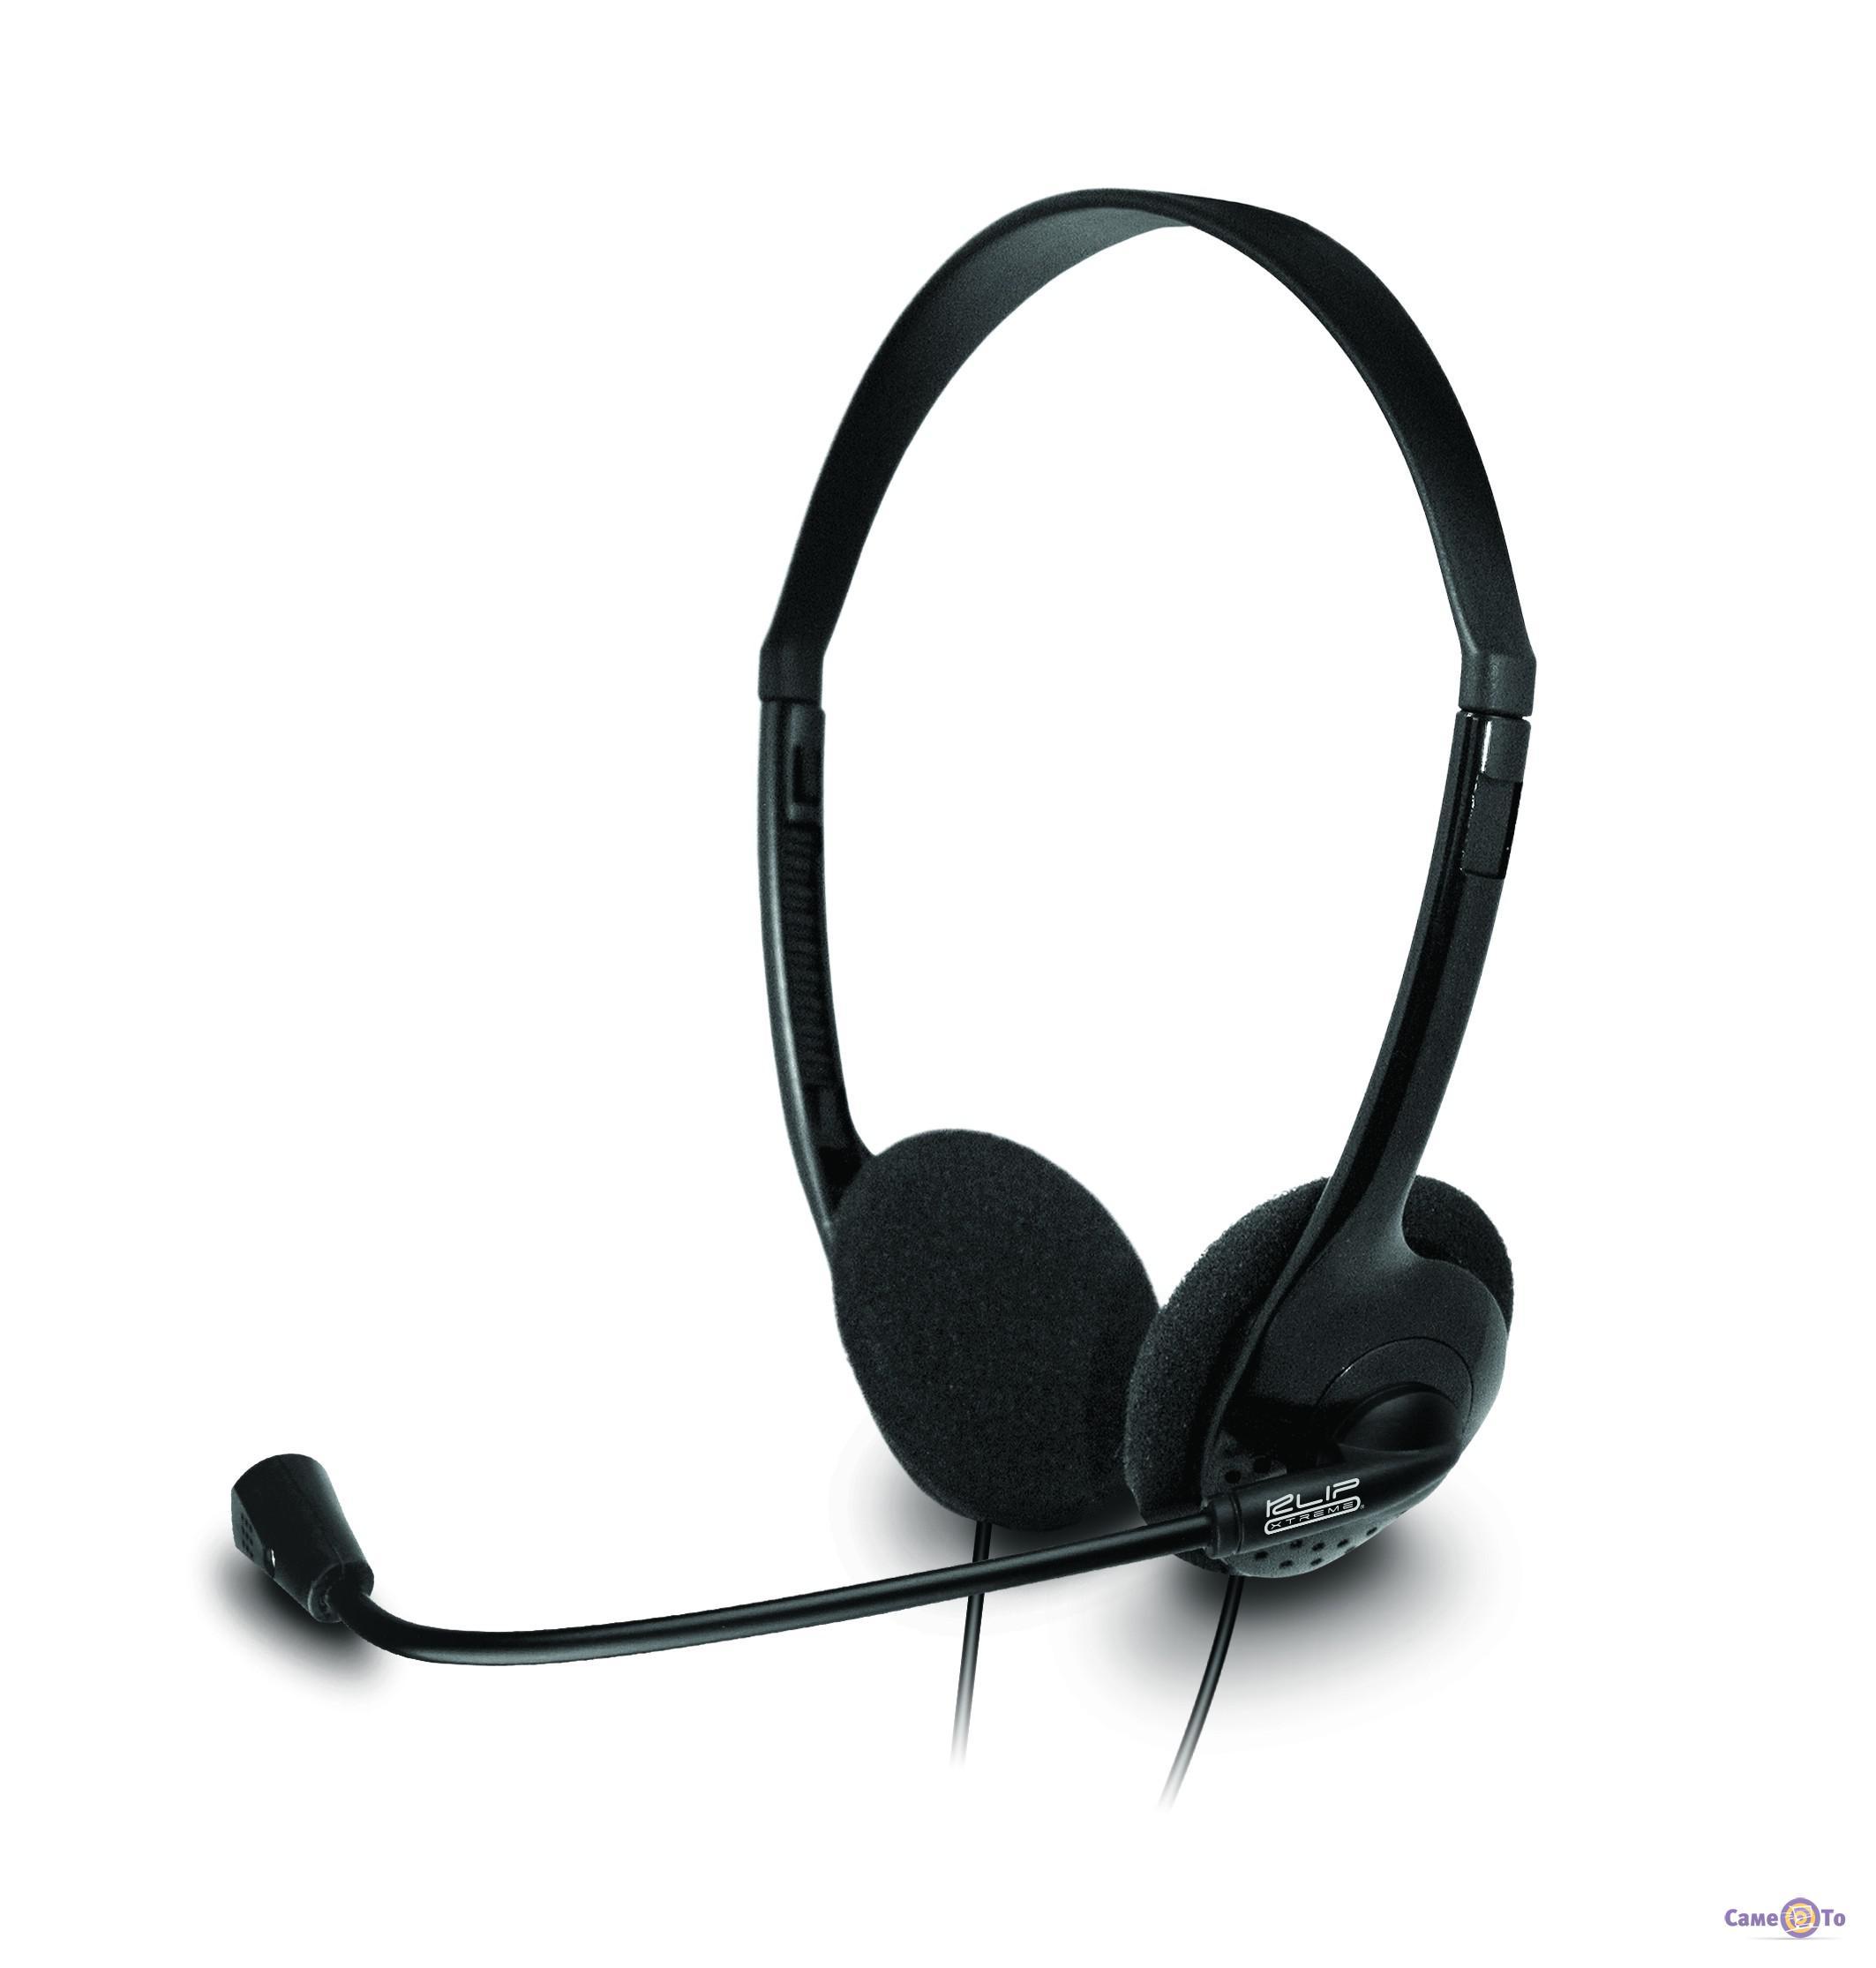 Навушники-гарнітура з мікрофоном Klip Xtreme Talk KSH-280 5d3ec6d2d7a0a